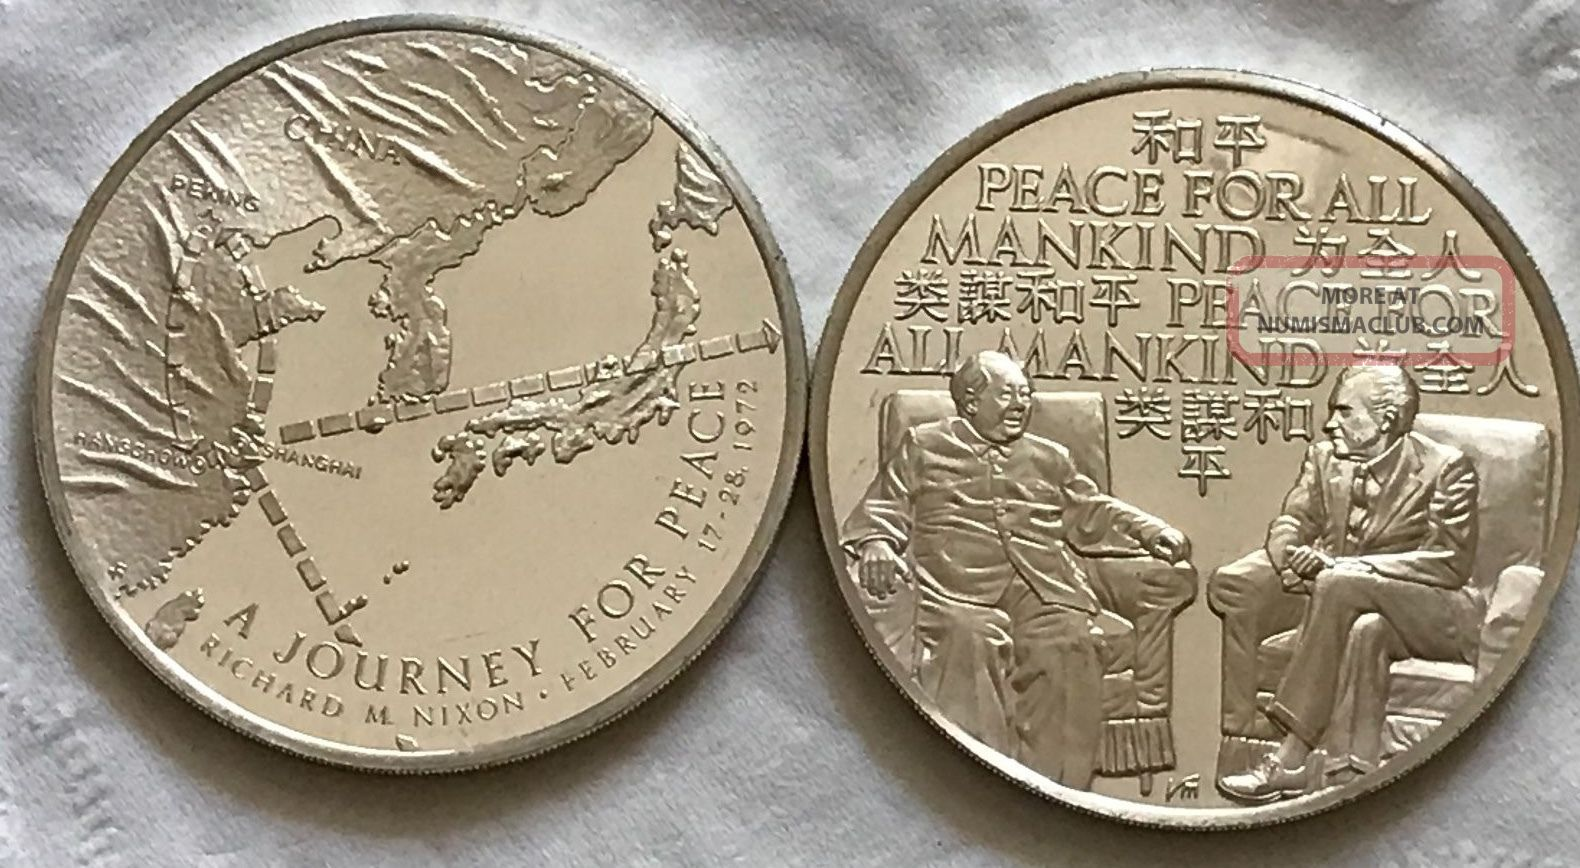 1972 Nixon Presidential Journey For Peace China Silver Medal Exonumia photo